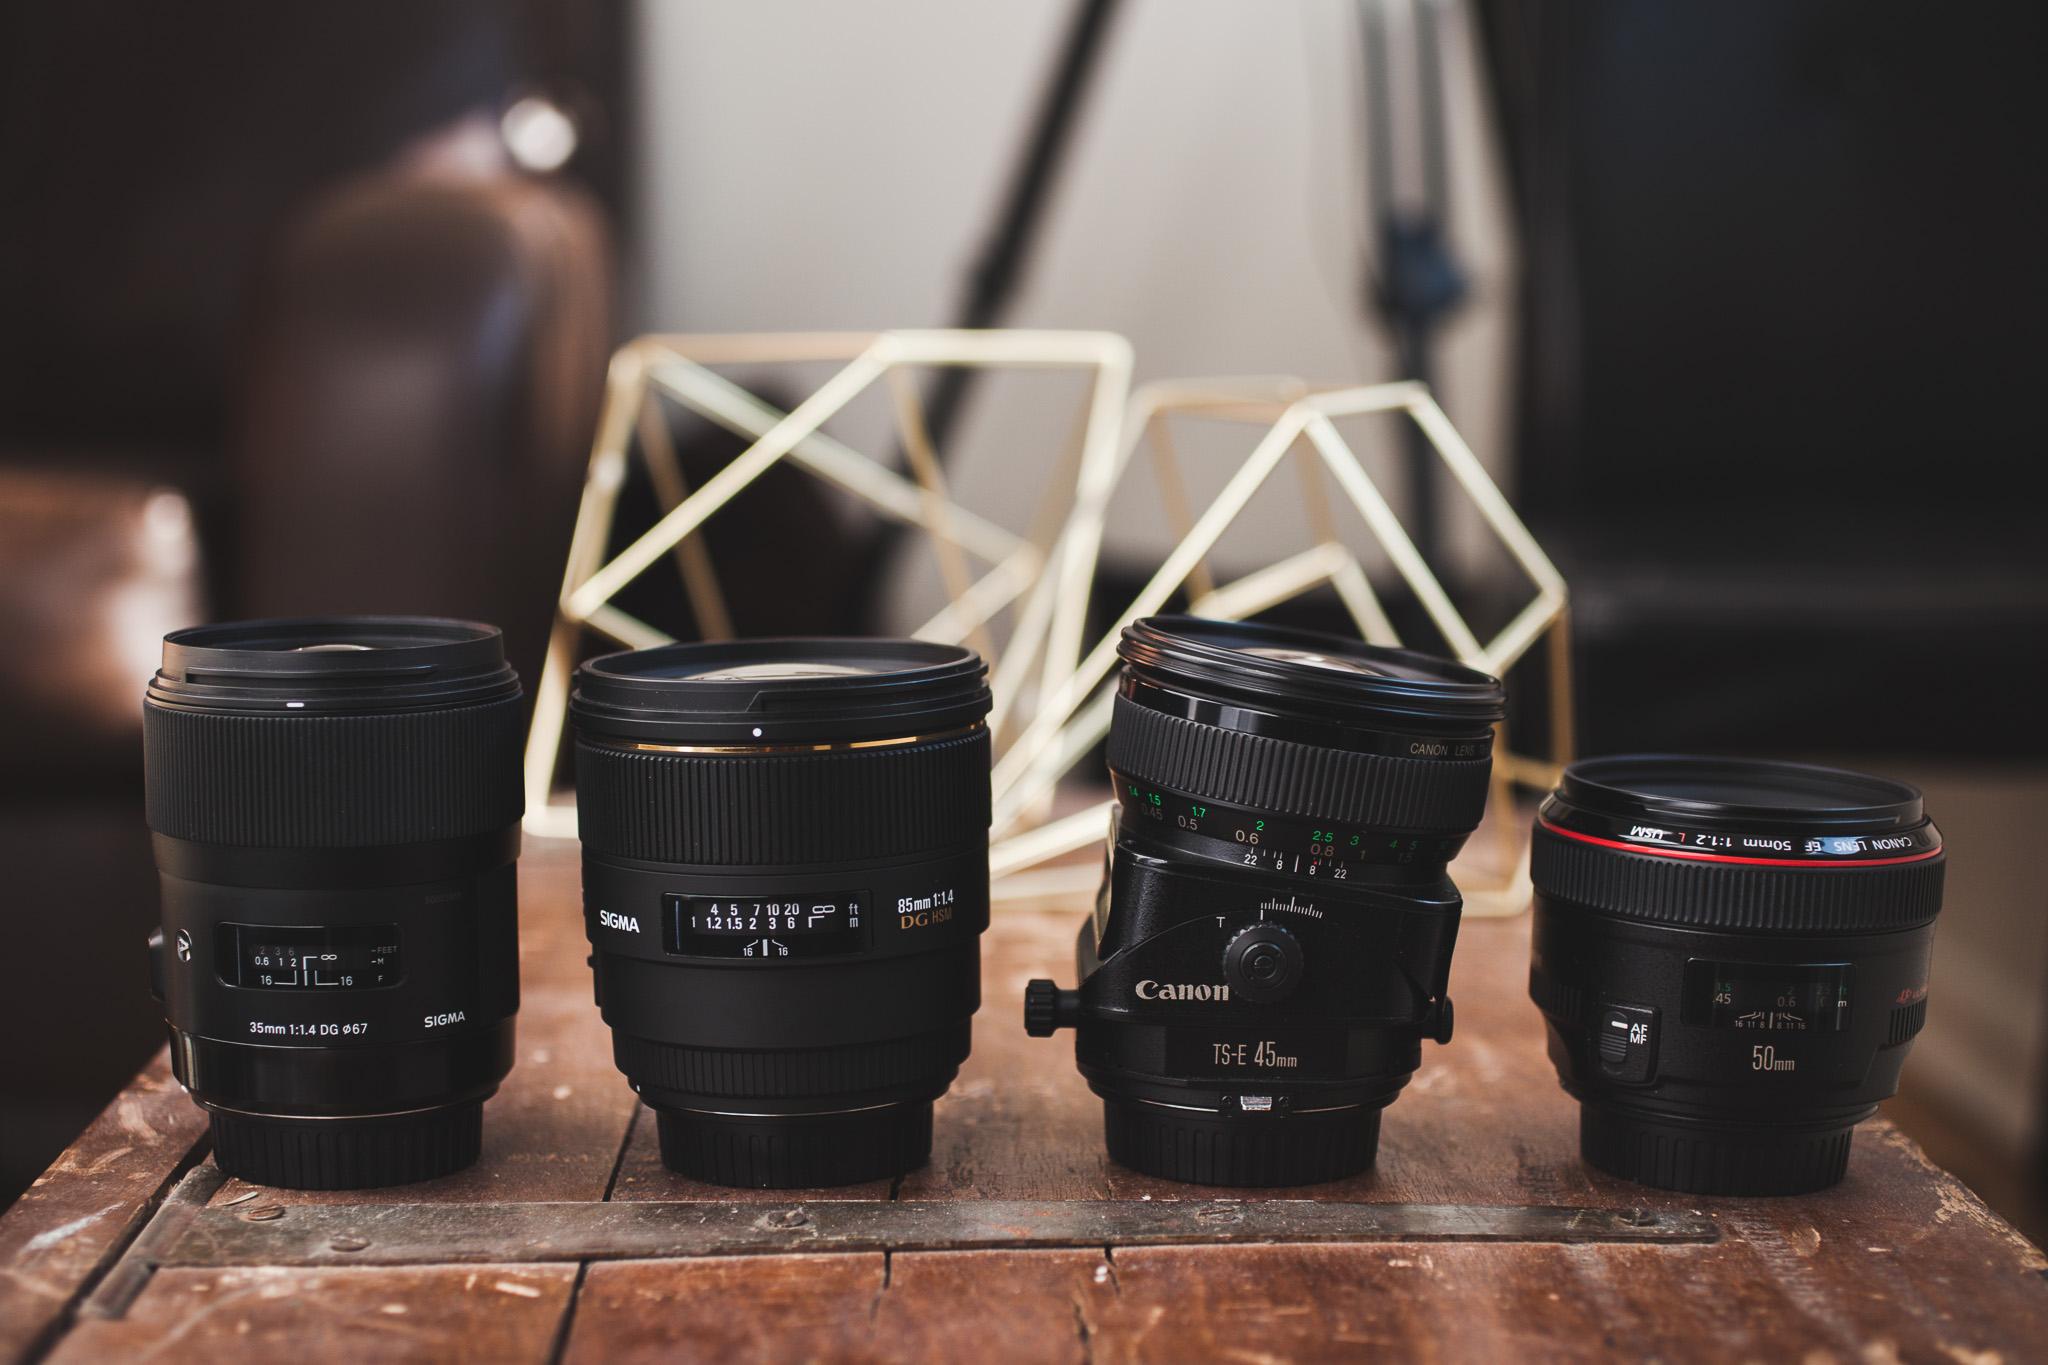 best-wedding-photography-lenses